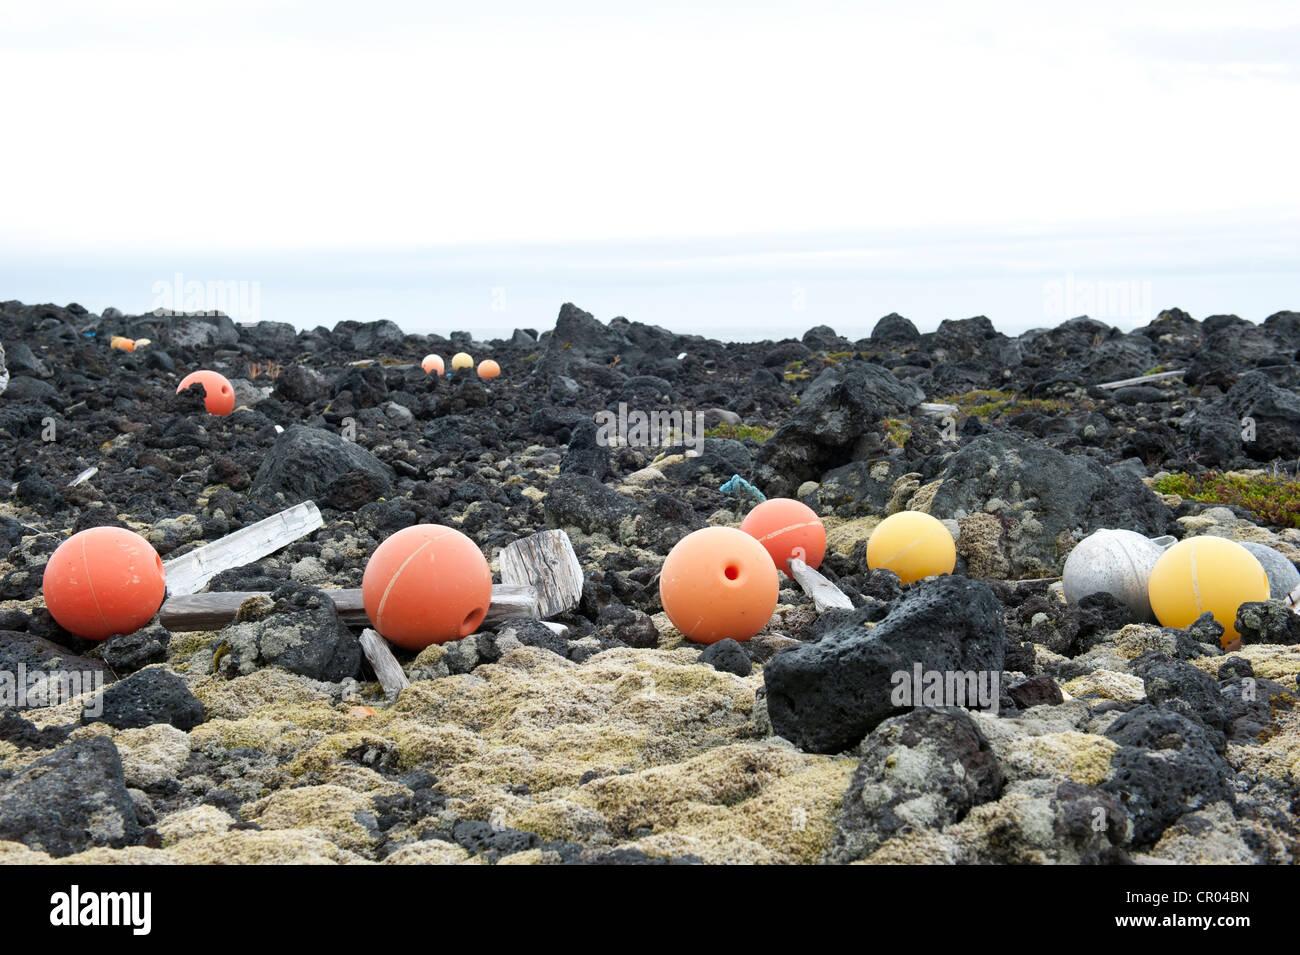 Buoys, swimmers, floating debris, stranded goods, near Dritvík, Snæfellsnes peninsula, Ísland, Iceland, - Stock Image